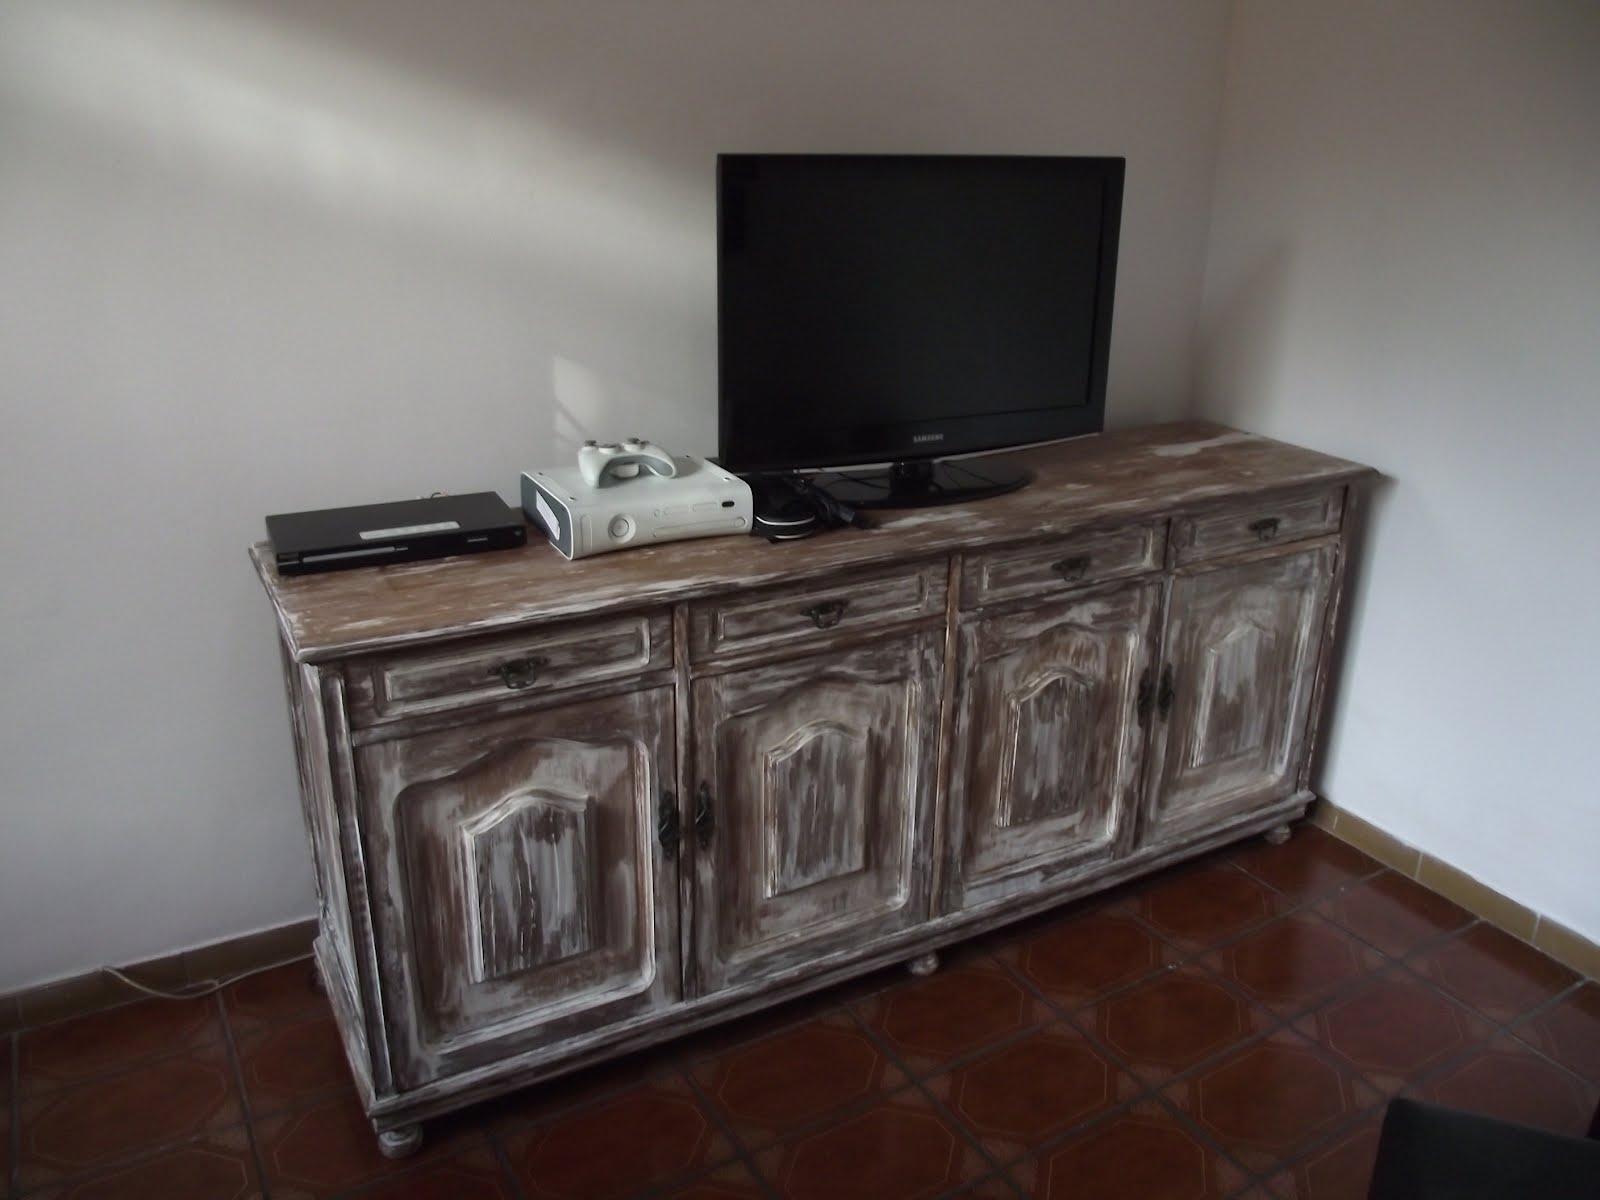 Marcos Bertosini: Móveis: Pátina #312422 1600x1200